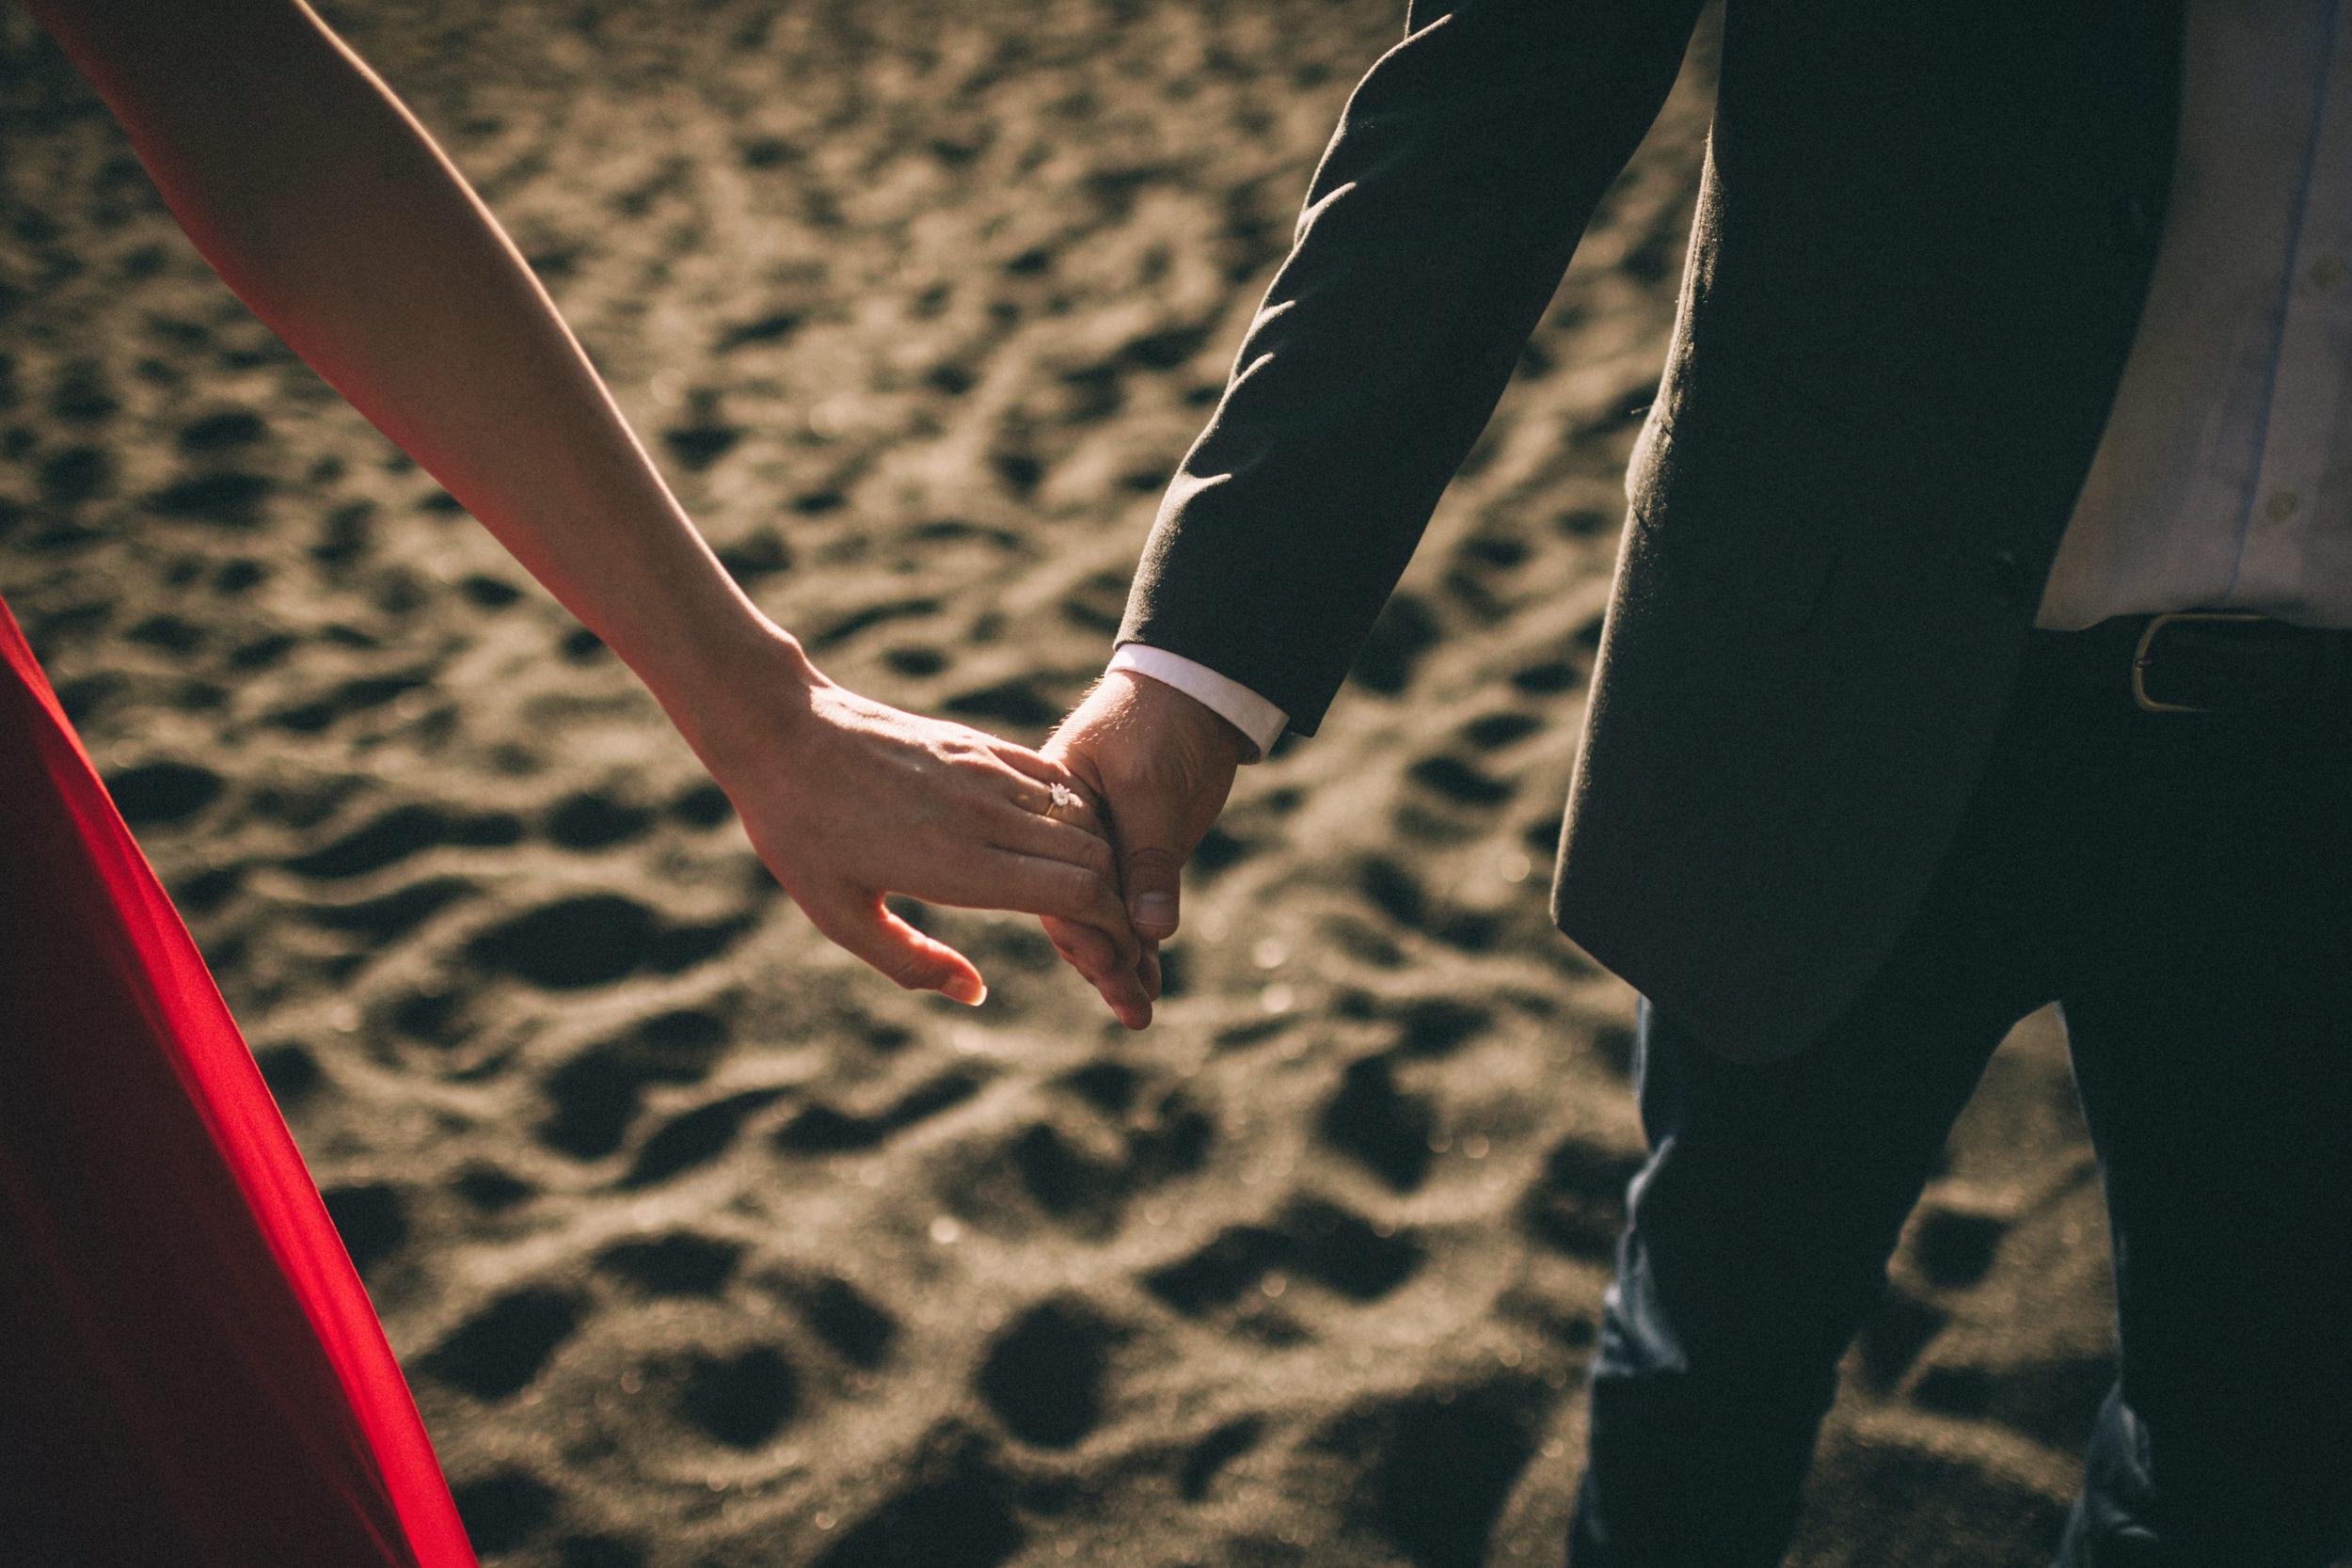 Sarah-Katherine-Davis-Photography-Iceland-Adventure-Elopement-Photographer-Louisville-Kentucky-Wedding-Photographer-Travel-Vik-Beach-Engagement-Session-Red-Dress-Reynisfjara-39edit.jpg